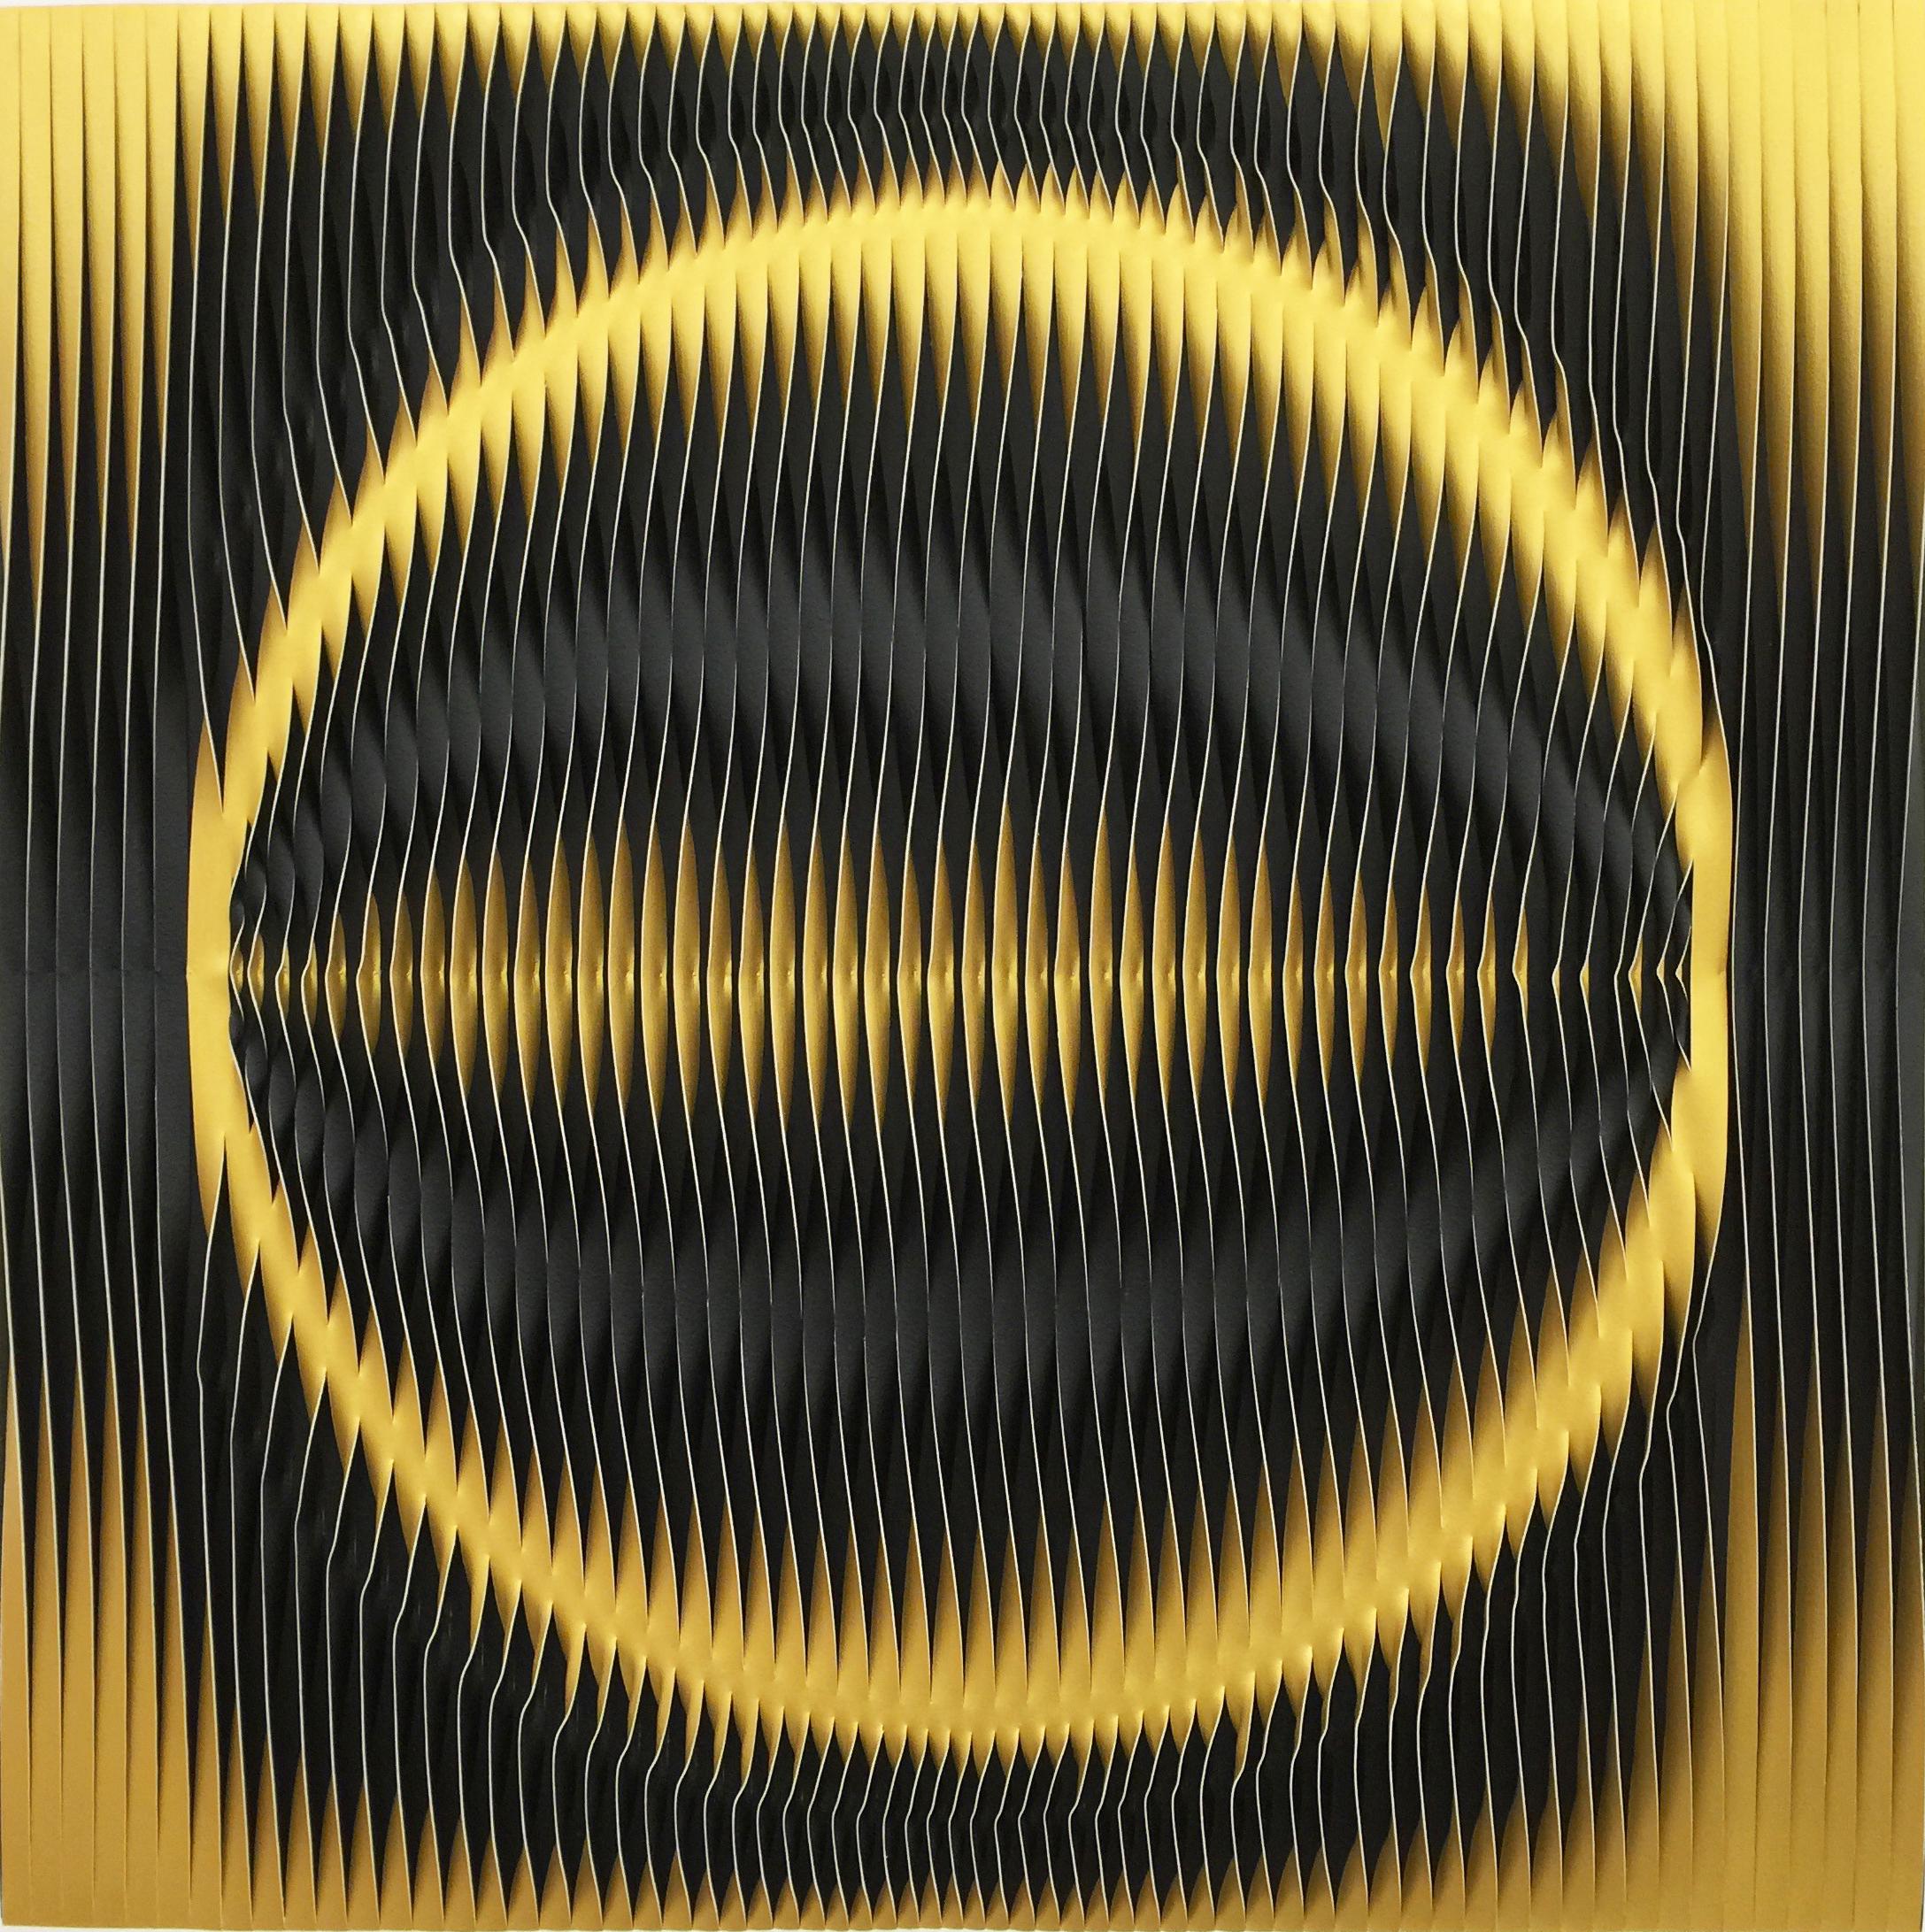 MARION BORGELT  Liquid Light: 78 Degrees . 2016 canvas, acrylic, timber, pins 120.0 x 120.0 x 5.0 cm